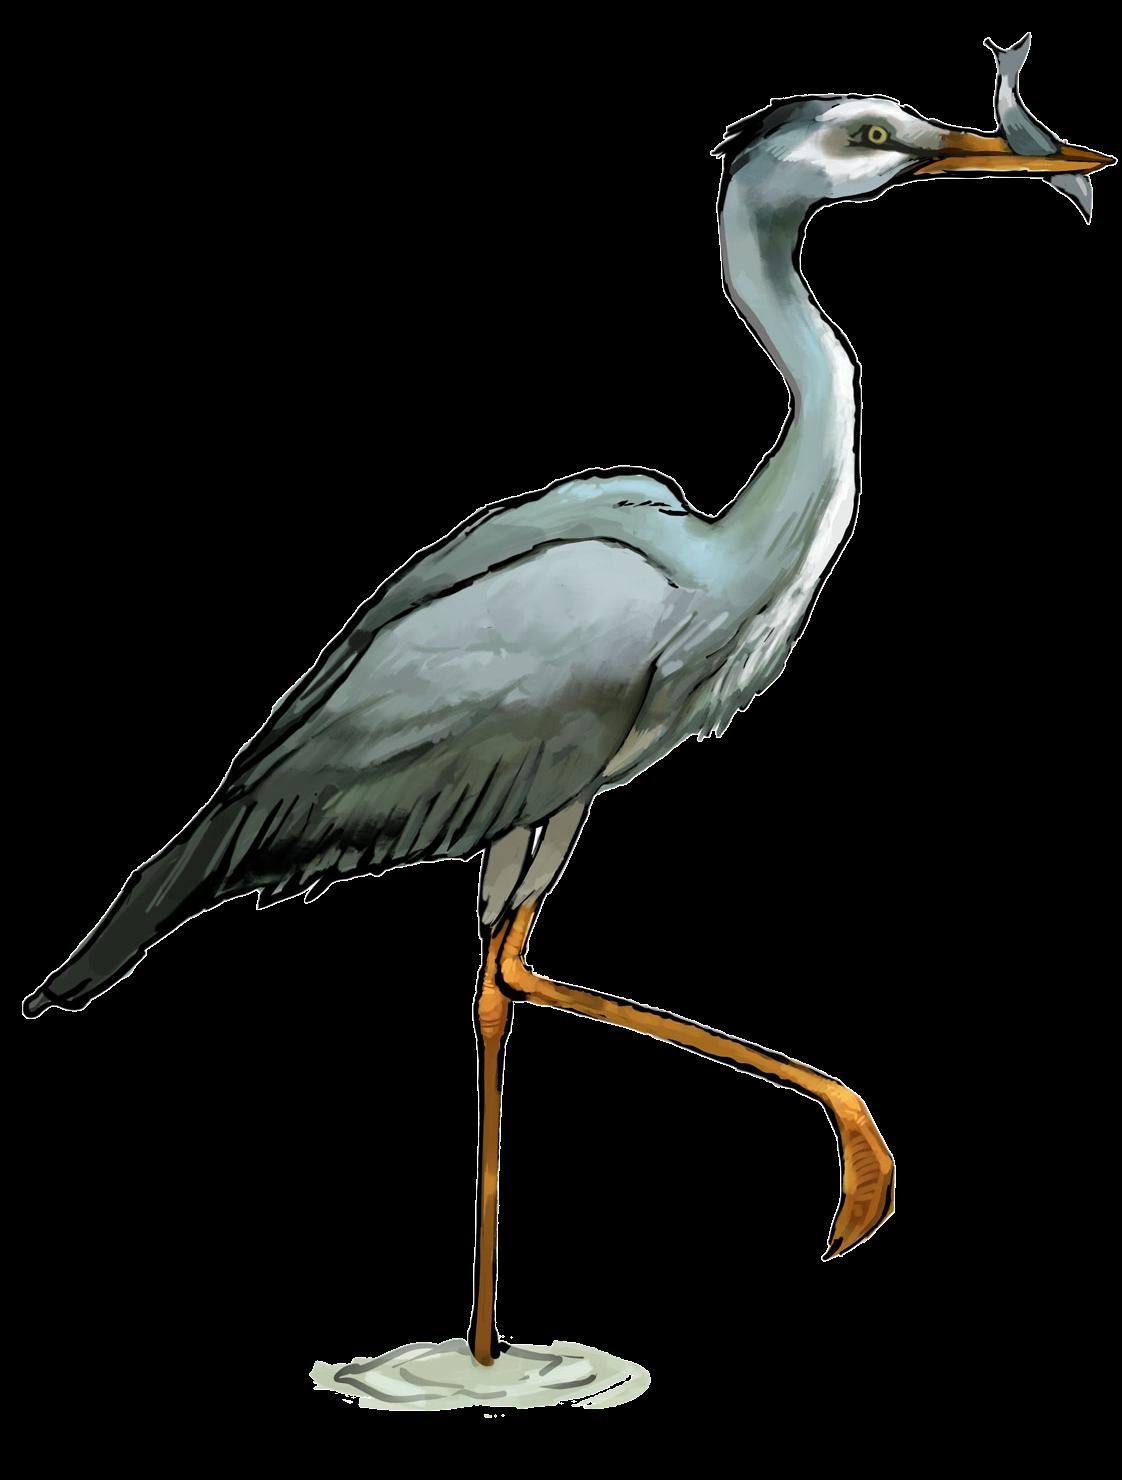 Heron clipart Clip Art Heron  Free